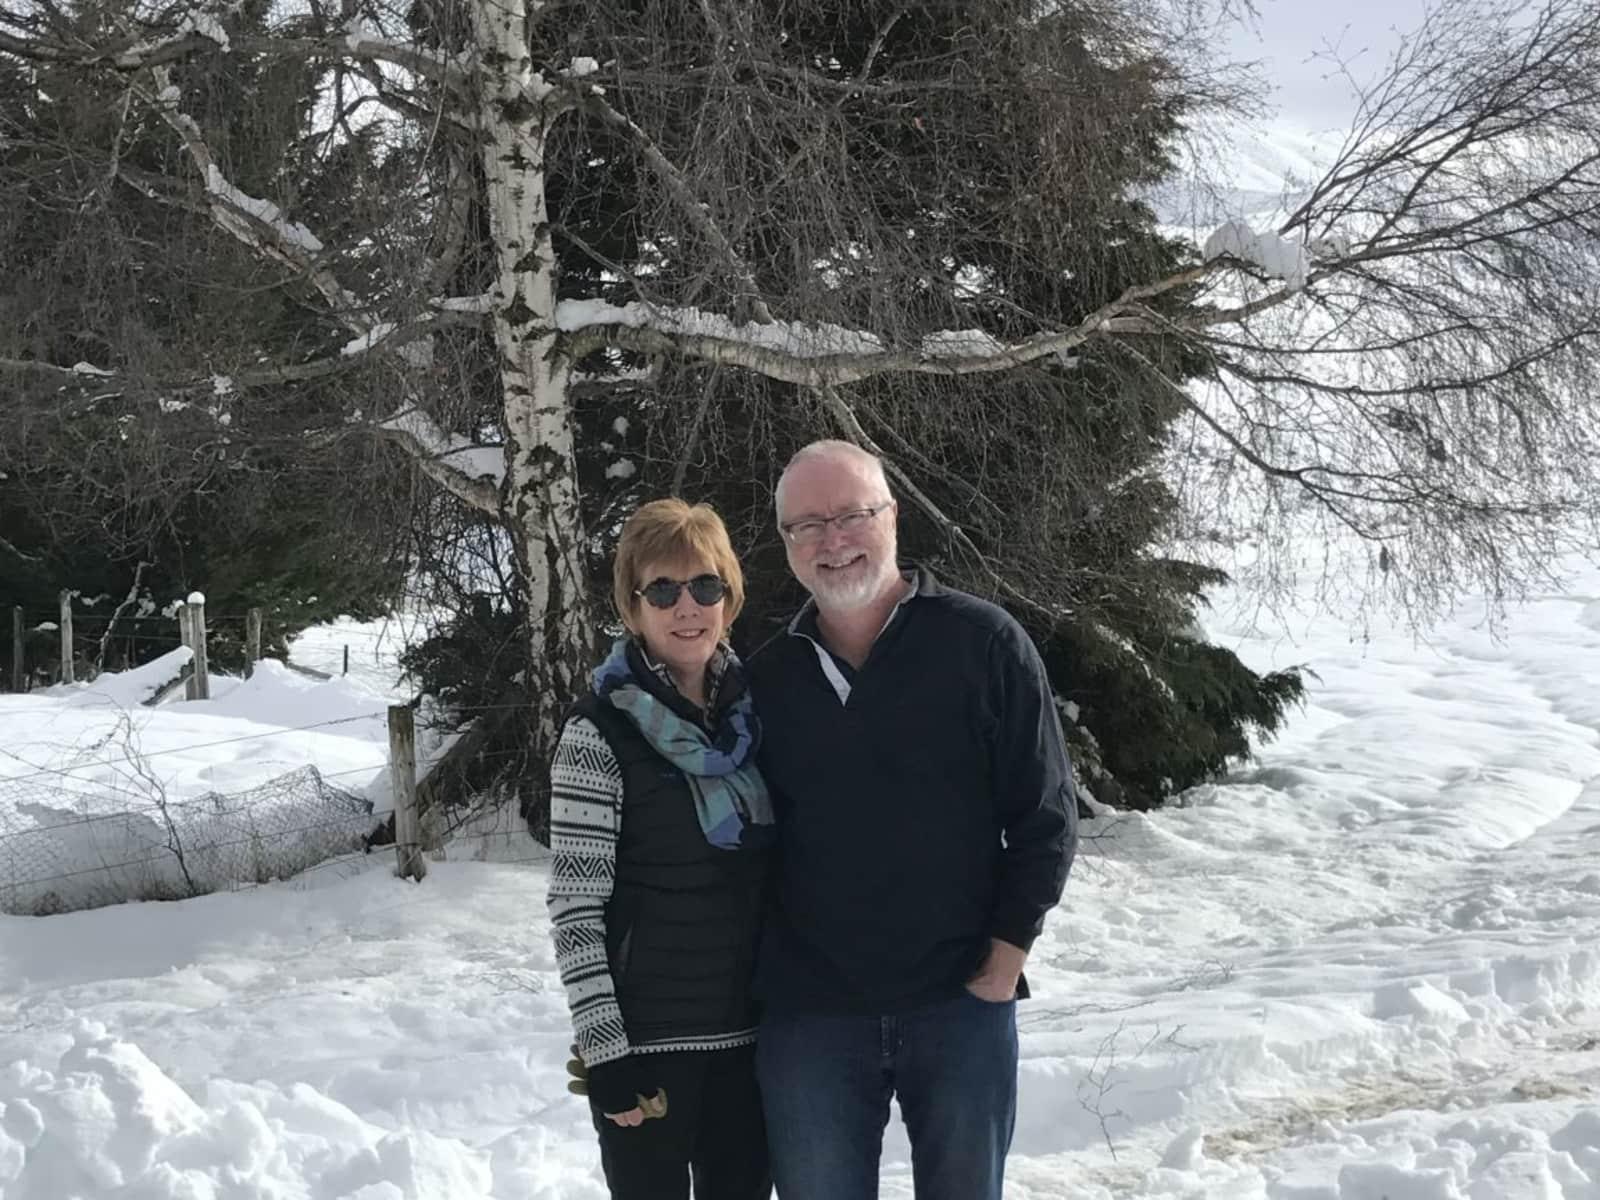 Susan & Howard from Christchurch, New Zealand